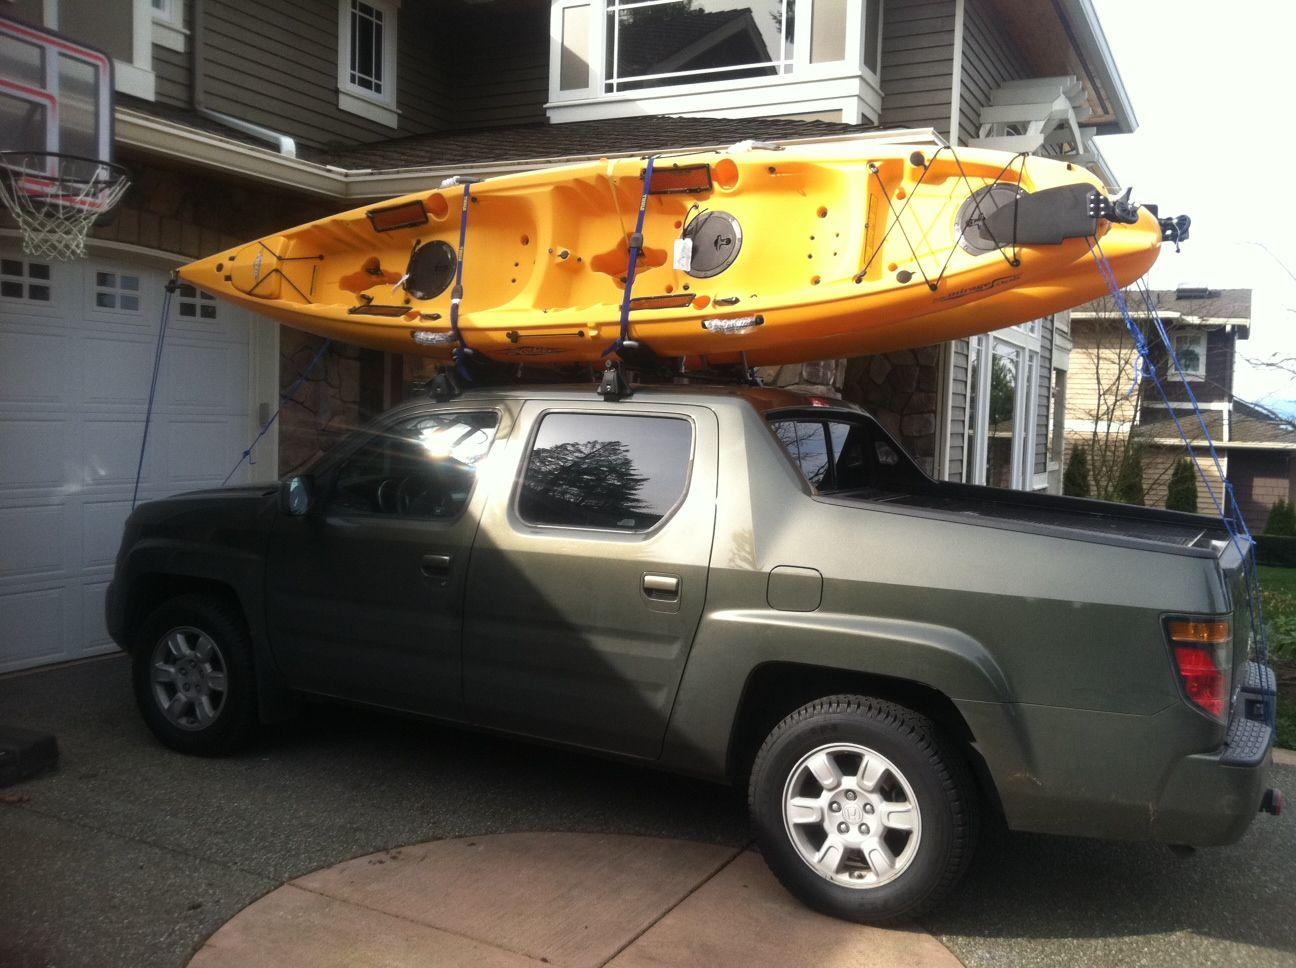 Honda Ridgeline Kayak Roof Rack, Truck Racks for Kayaks | Trucks ... | Kayak | Kayak roof rack ...